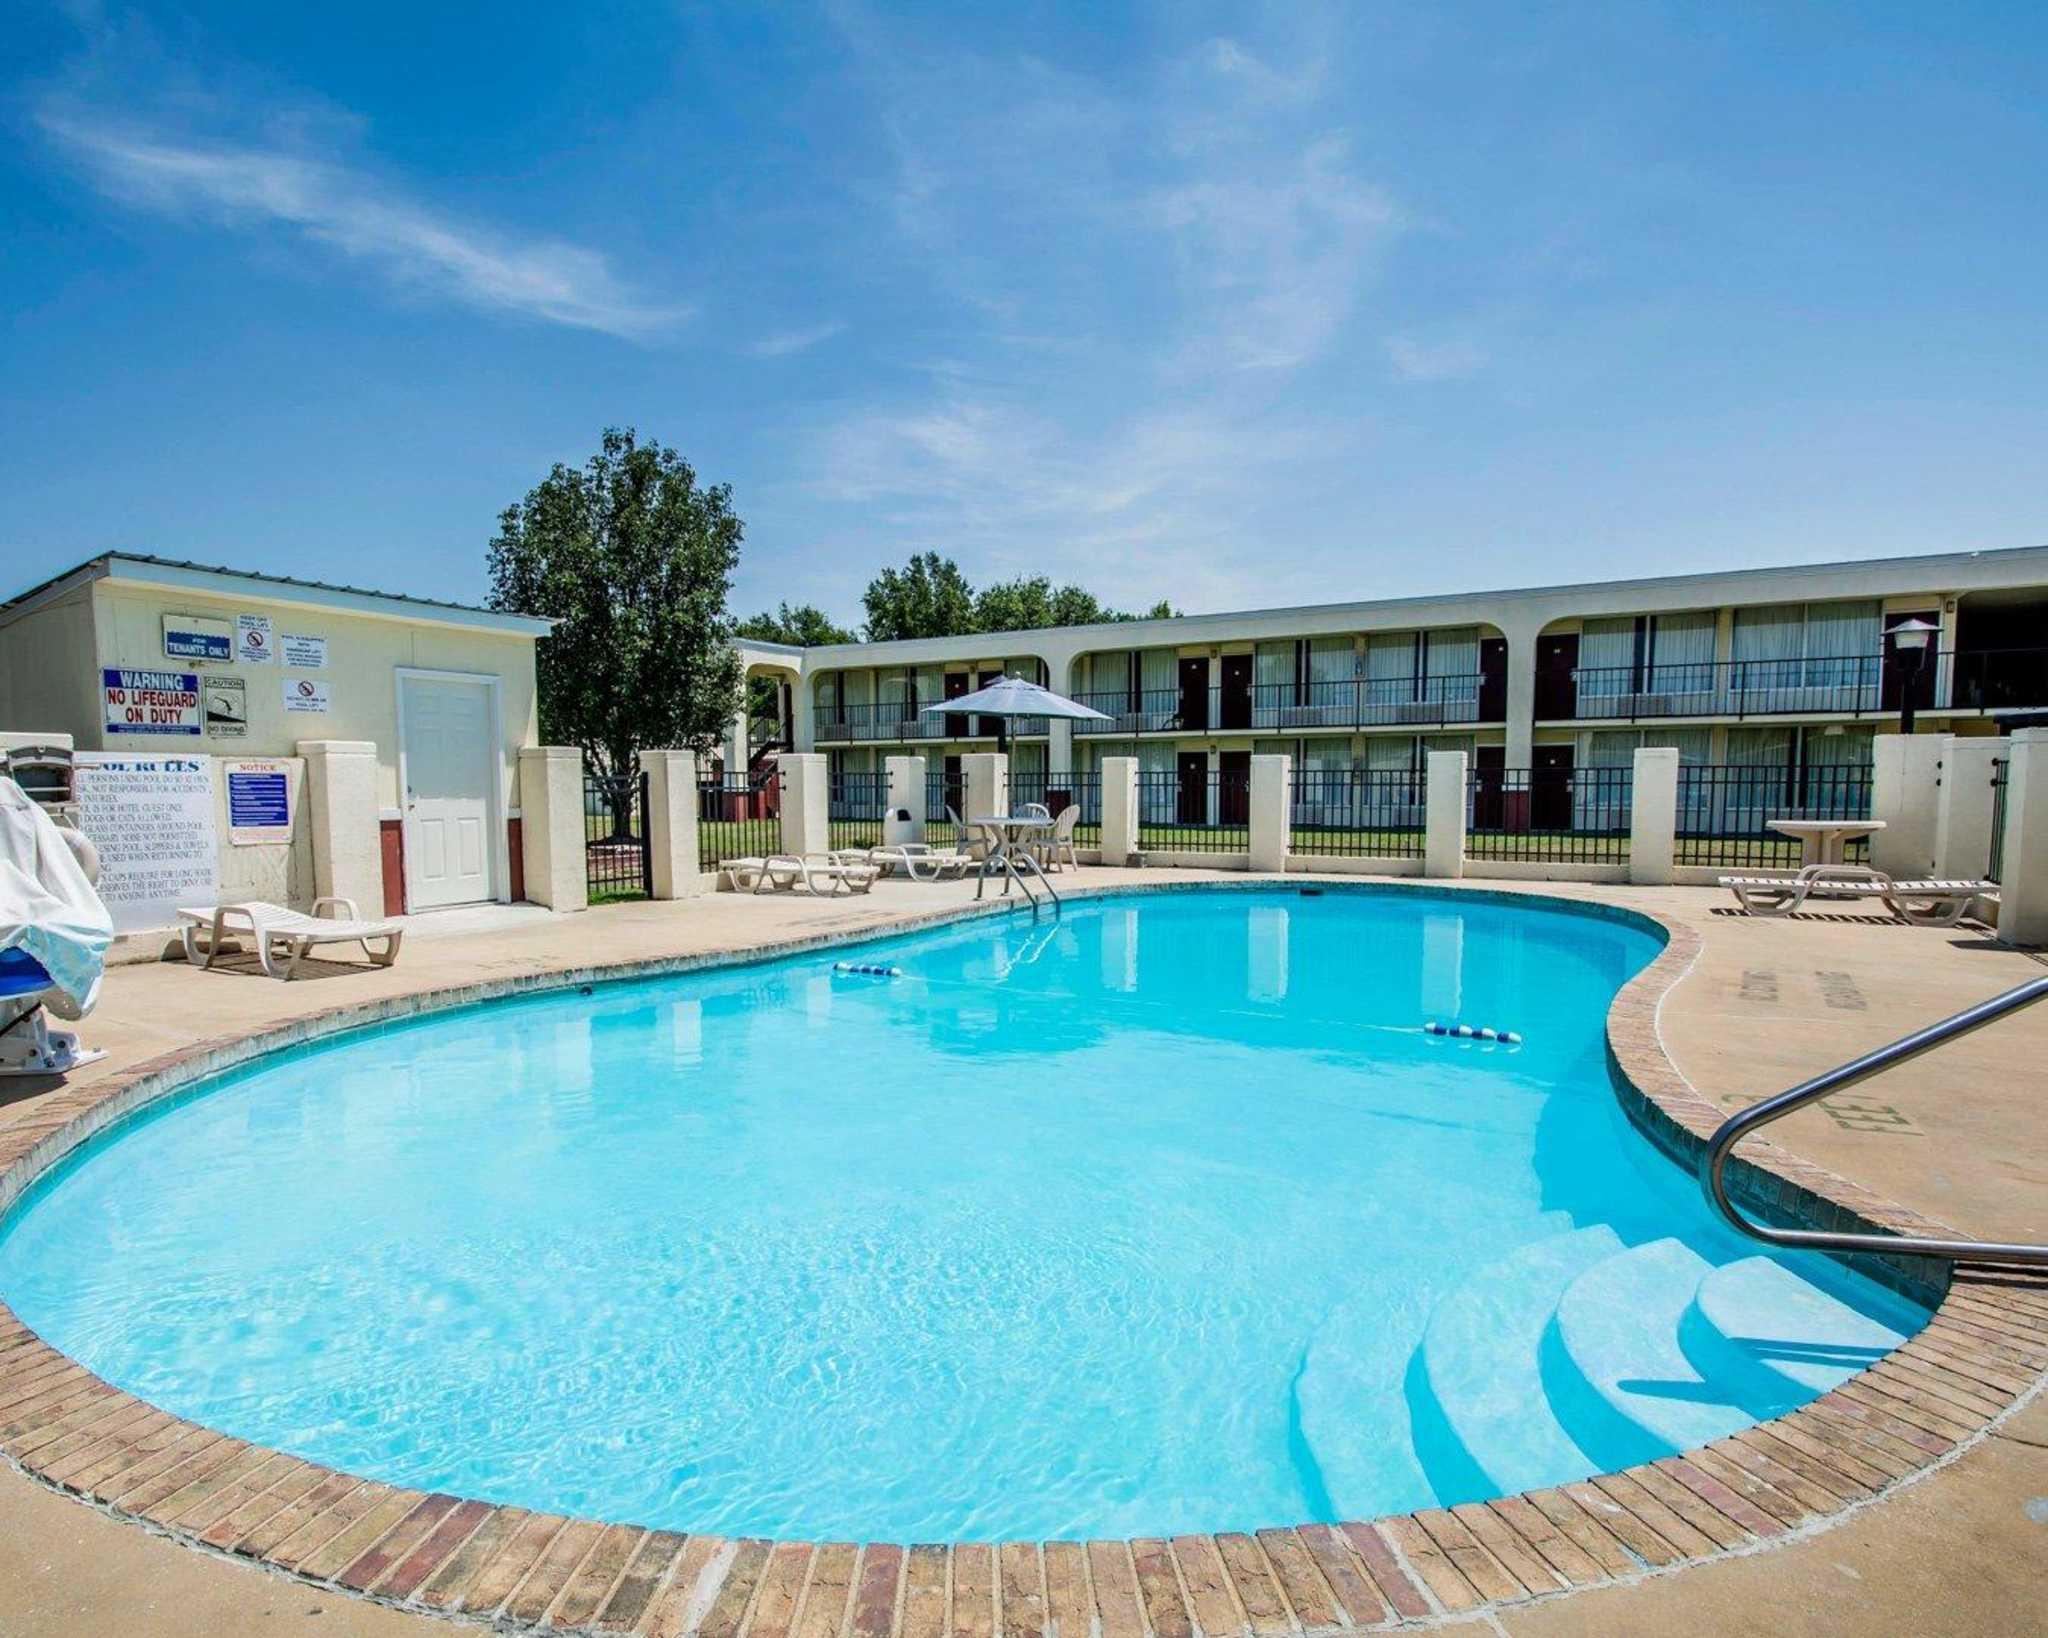 Hotels Near Andalusia Al